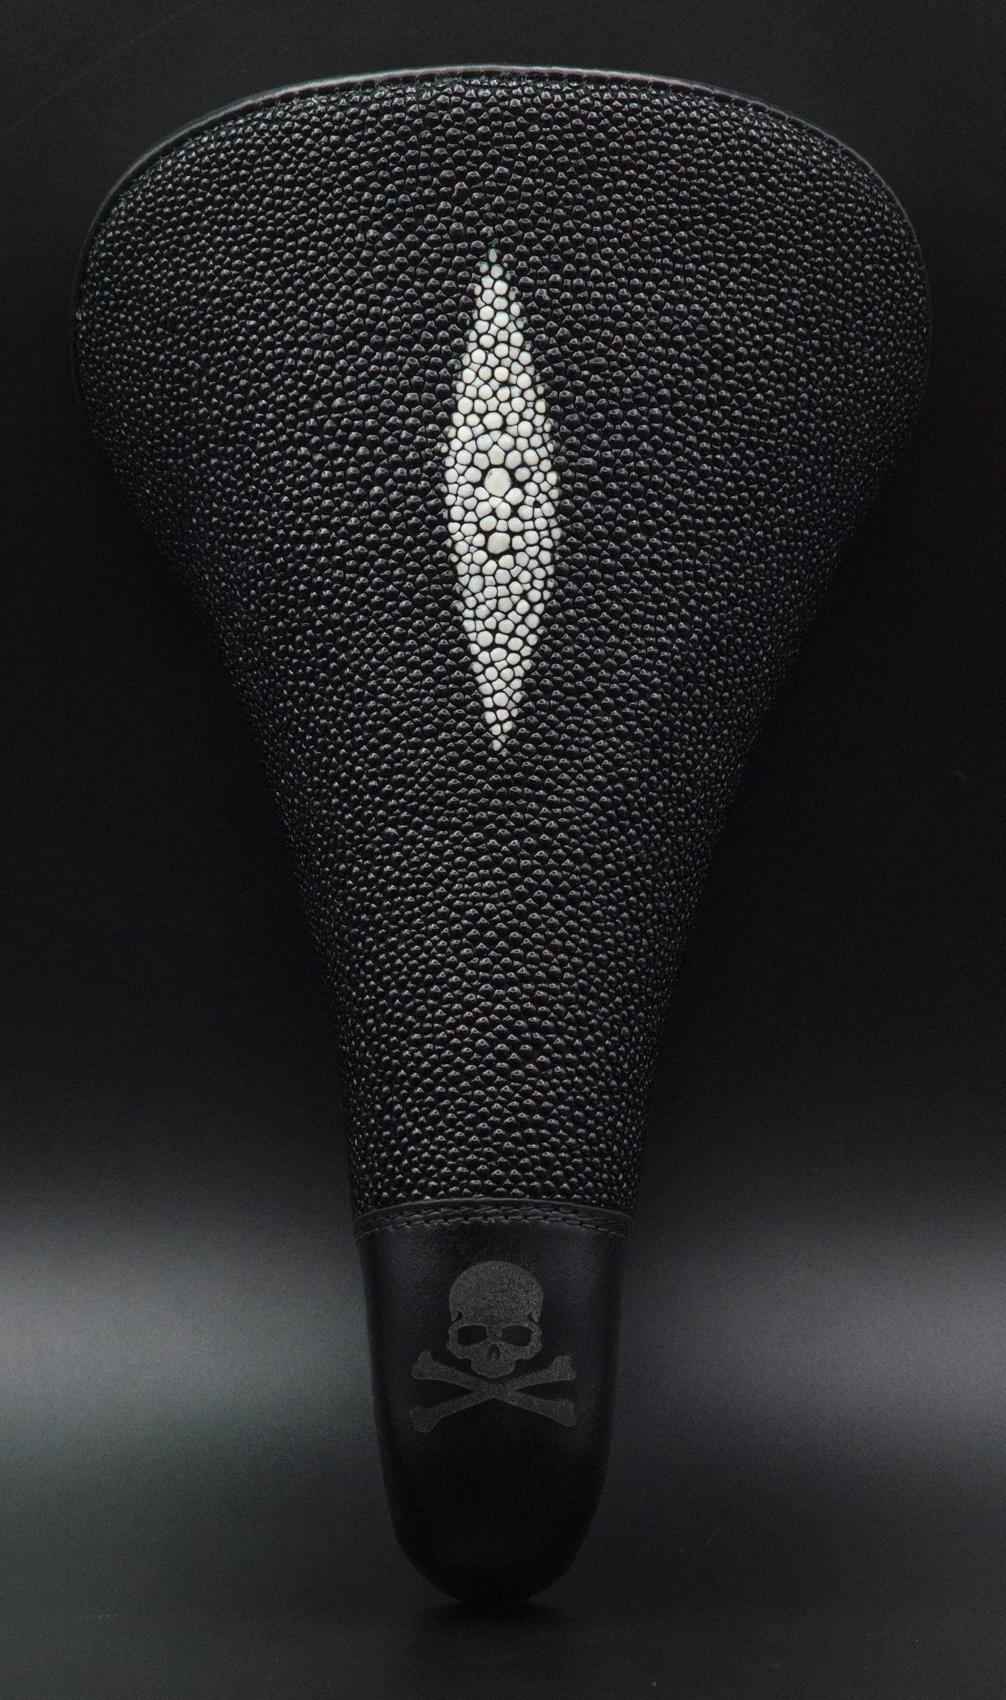 Leh cycling goods leather stingray saddle custom black skull and cross bones -5.jpg